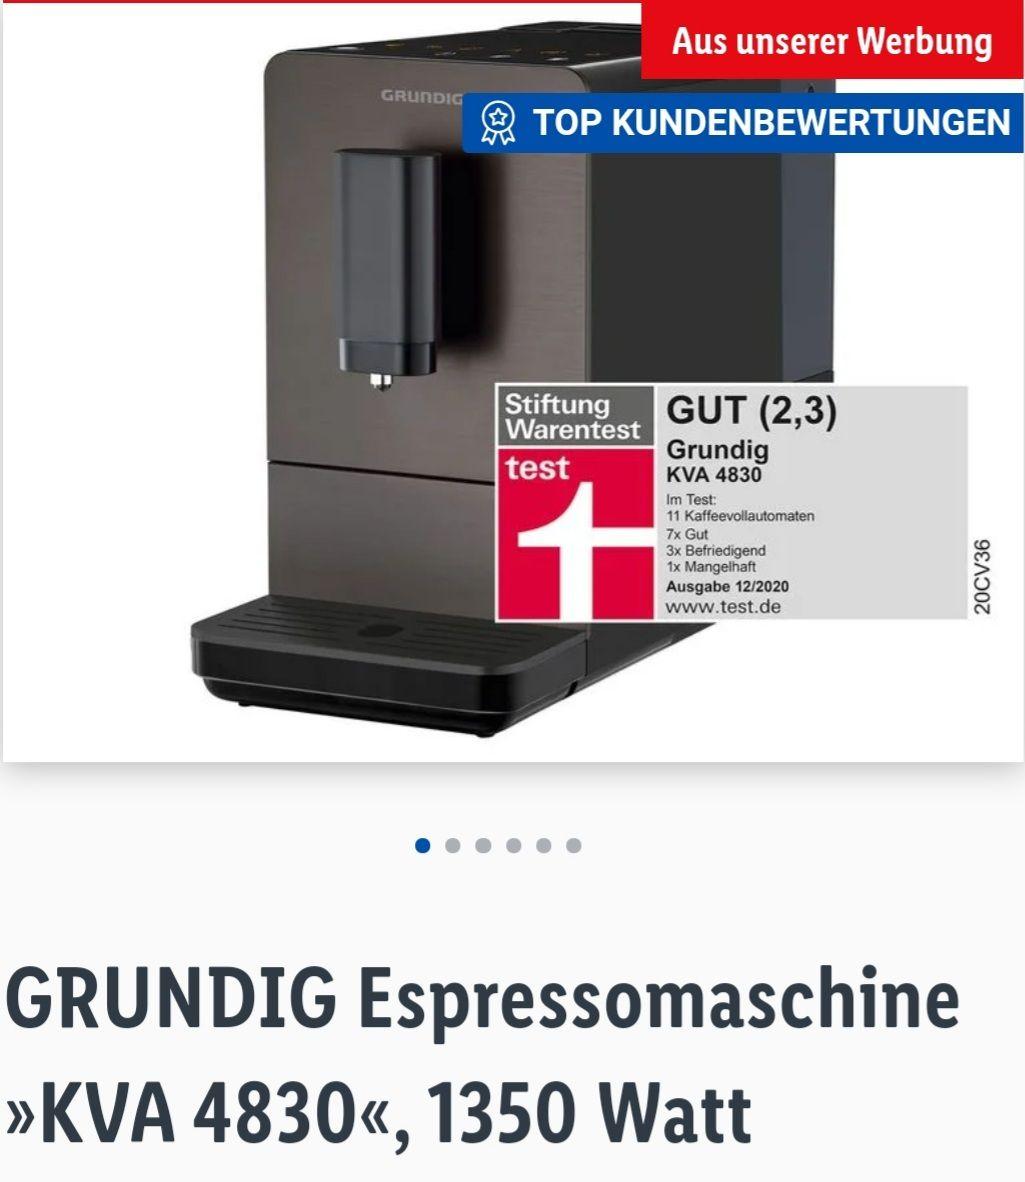 GRUNDIG Espressomaschine KVA 4830 1350 Watt Lidl Online